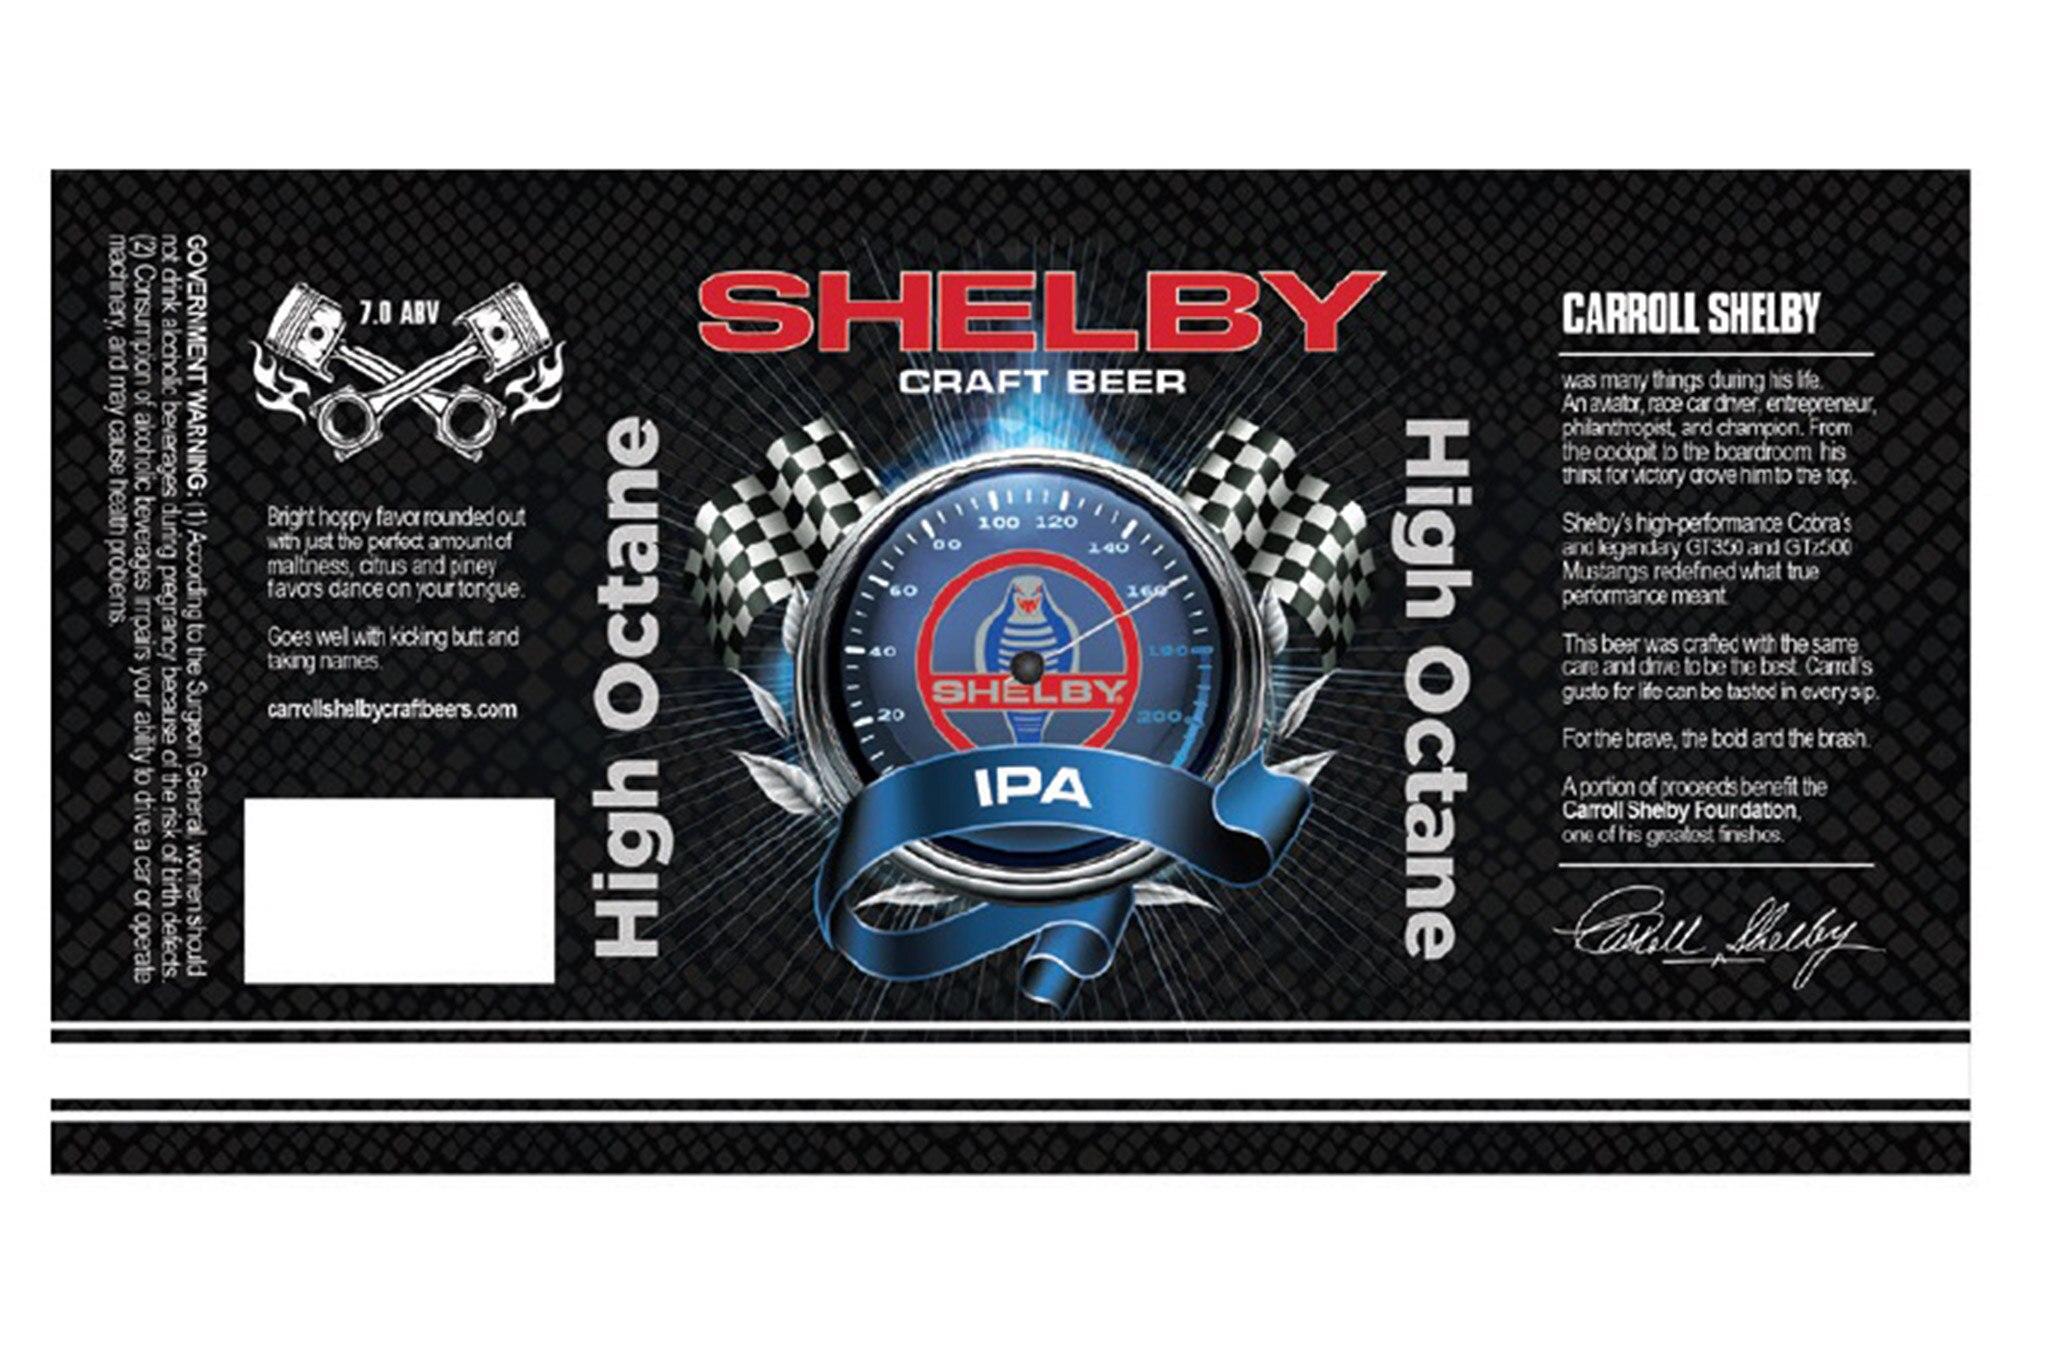 Carroll Shelby Craft Beer High Octane Ipa